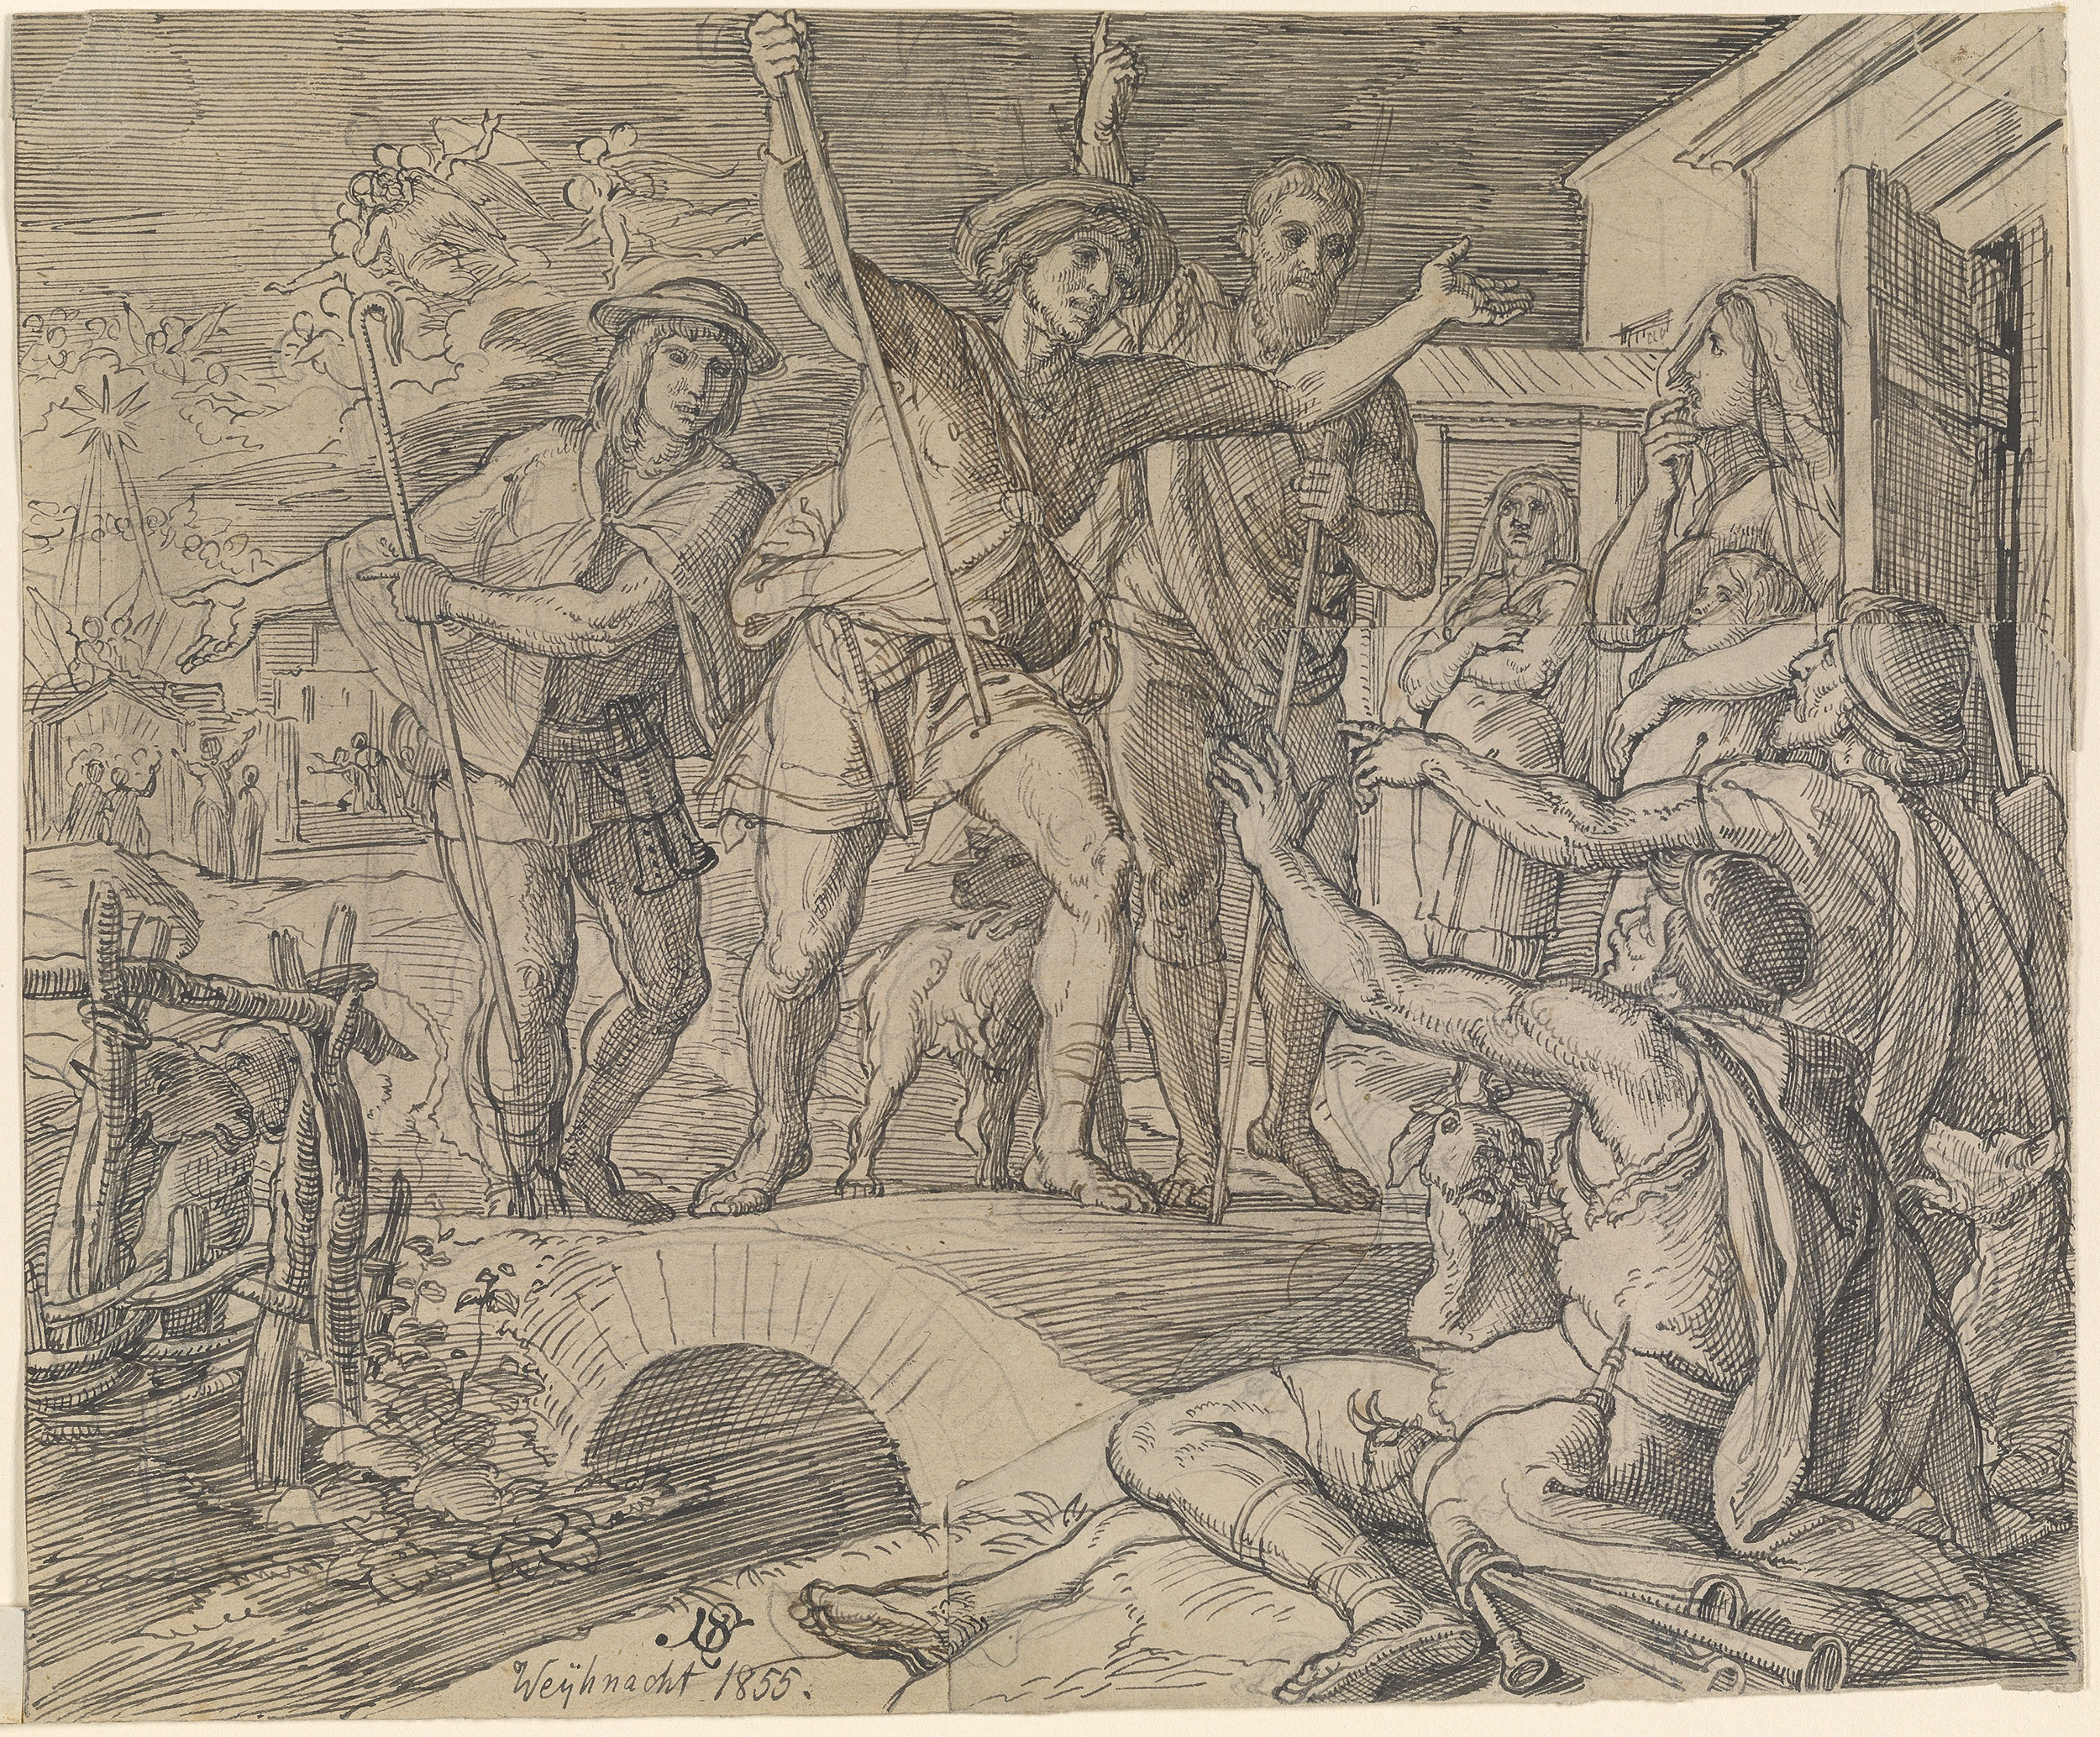 Julius Schnorr Von Carolsfeld Drawings 327661v_0001.jpg